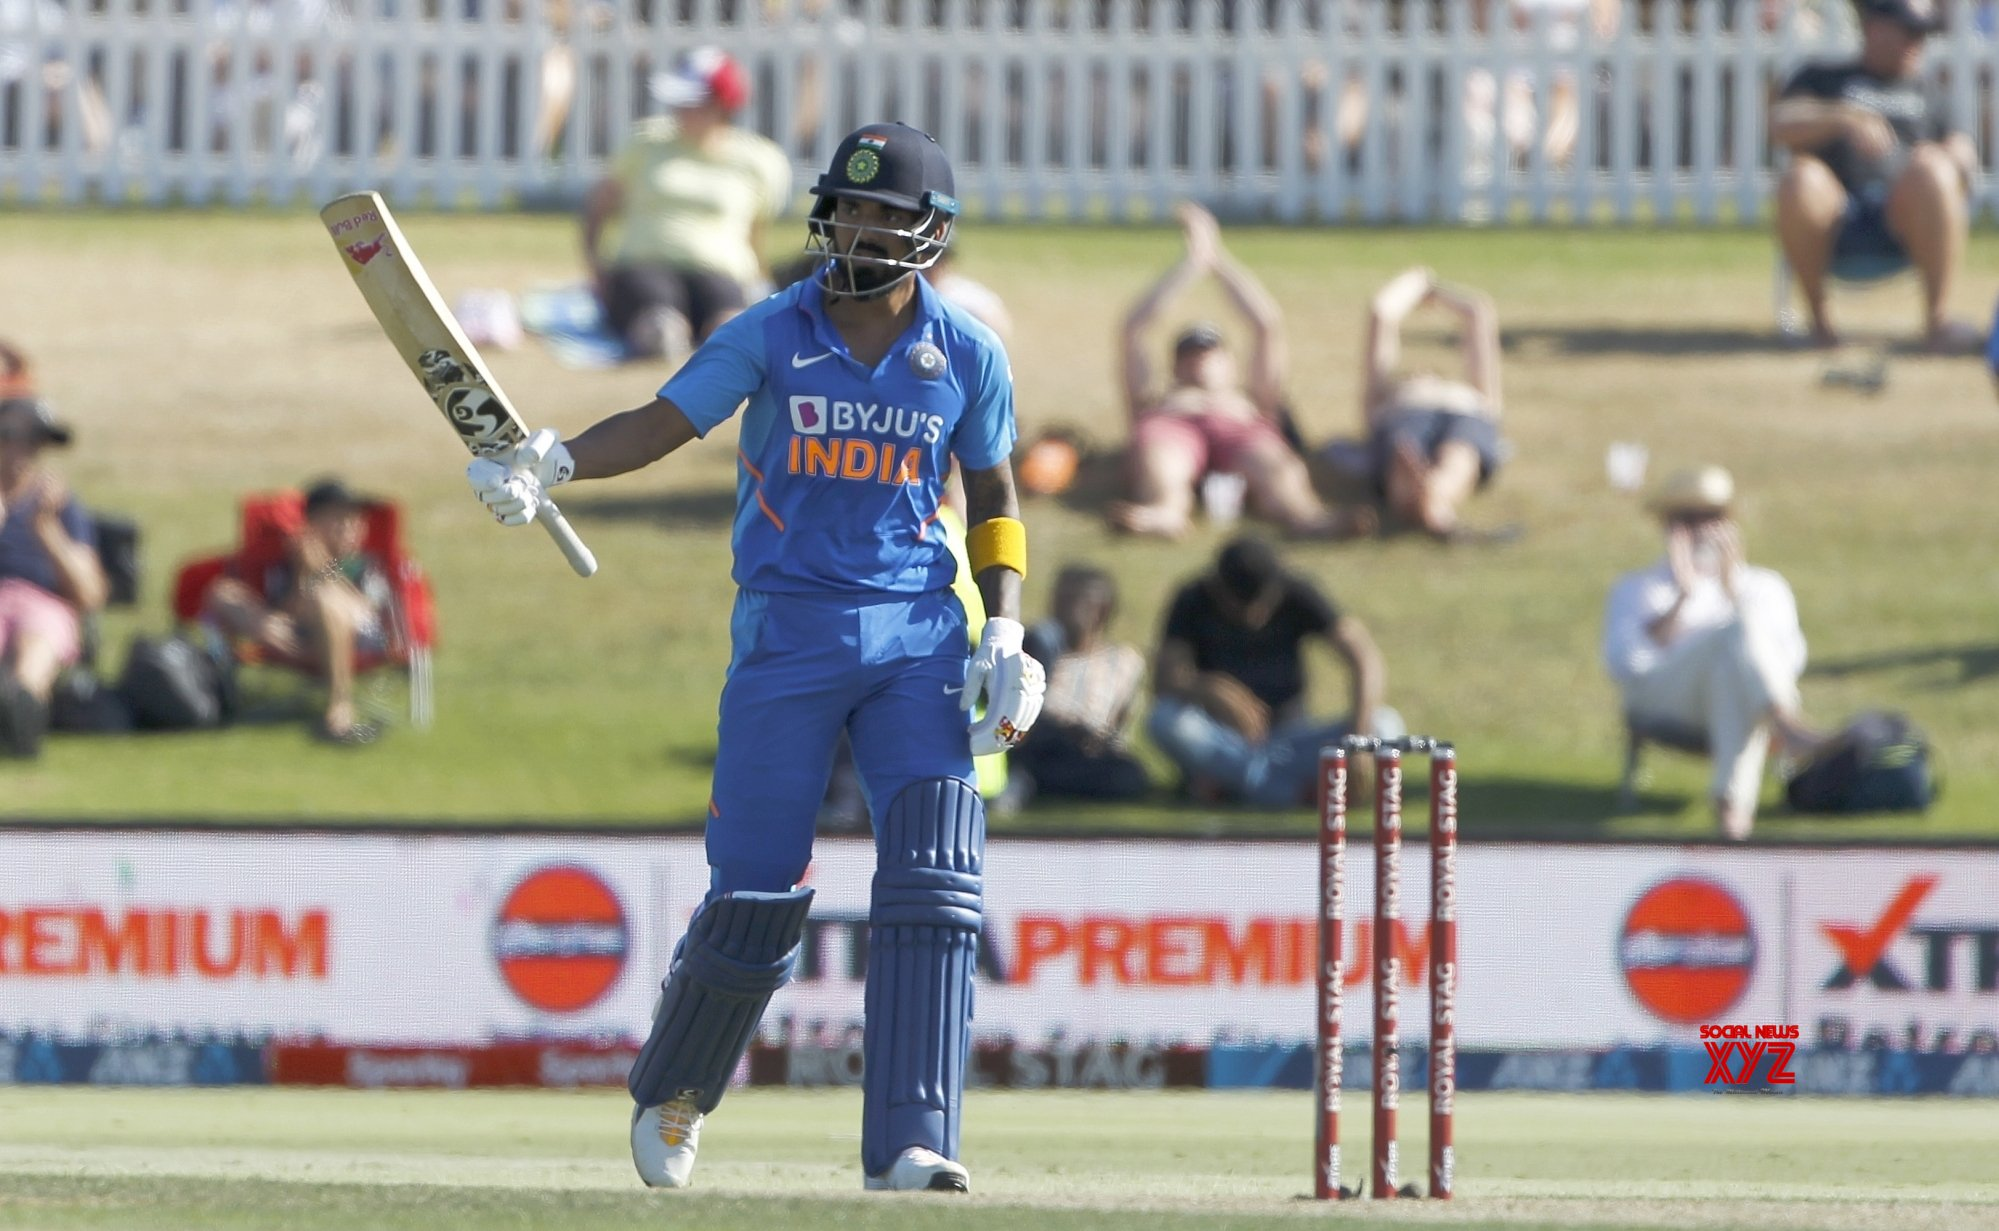 3rd ODI: Rahul ton helps India set 297-run target for NZ